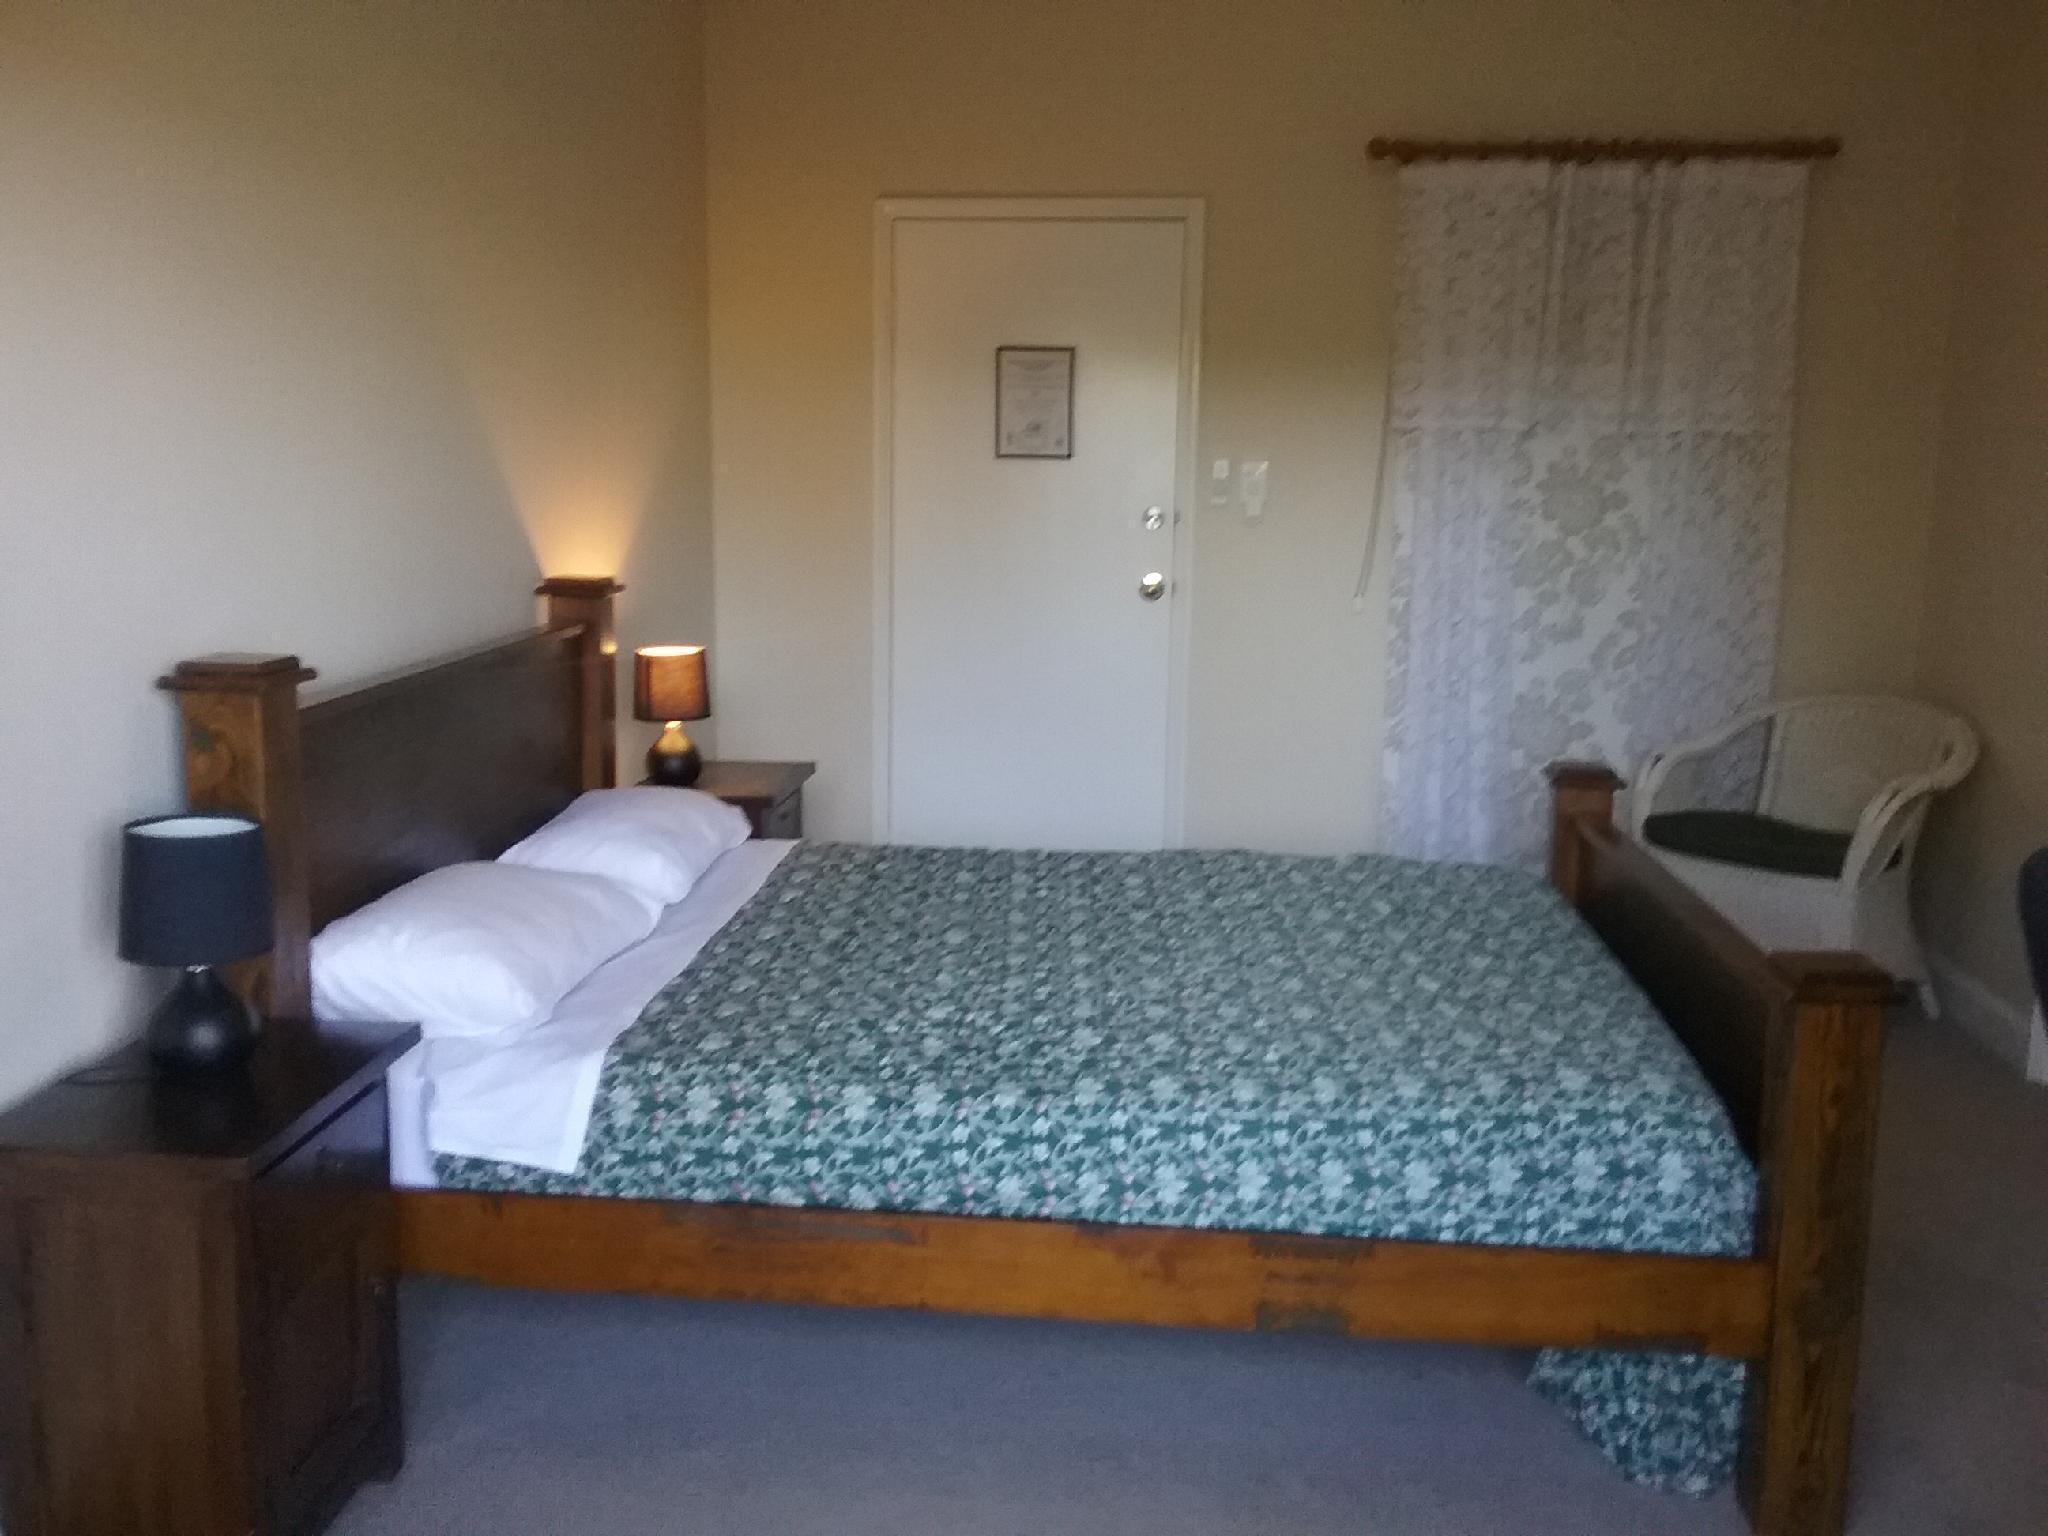 York Accommodation Services, York